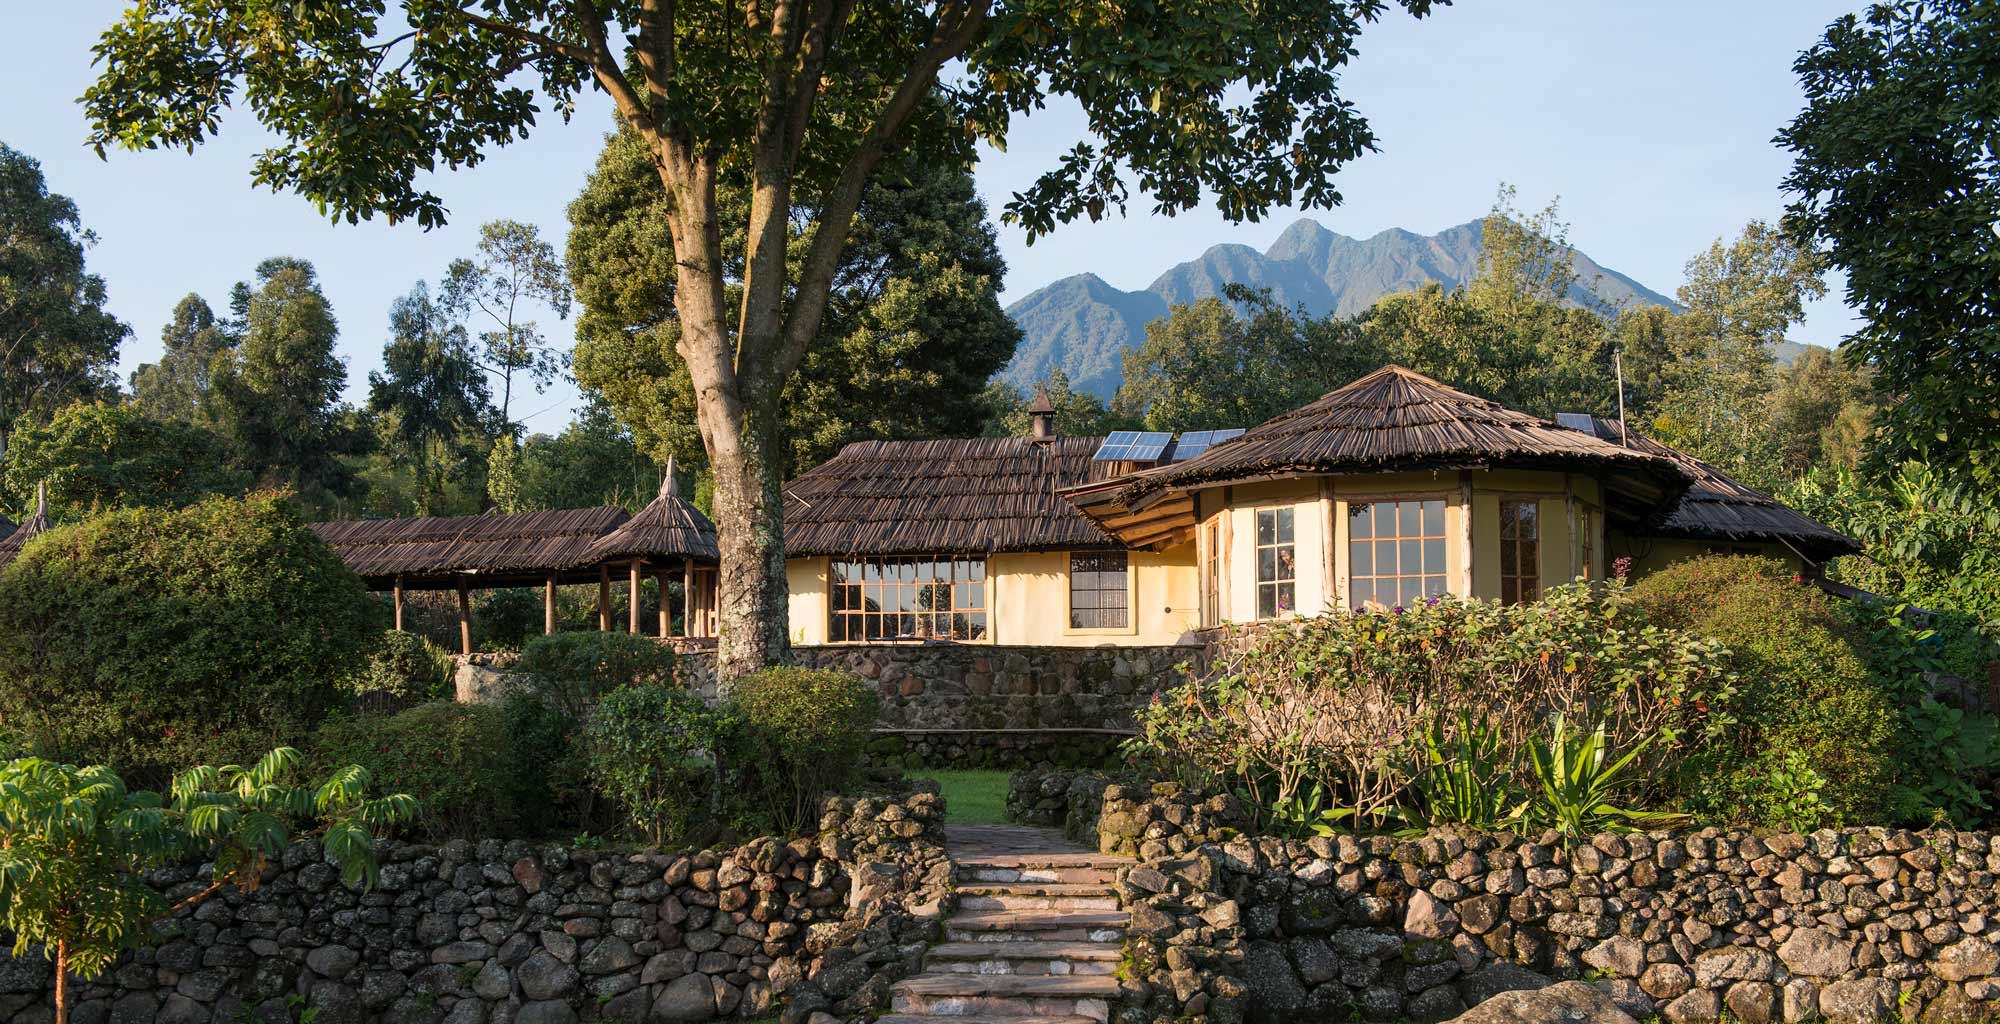 Uganda-Mount-Gahinga-Exterior